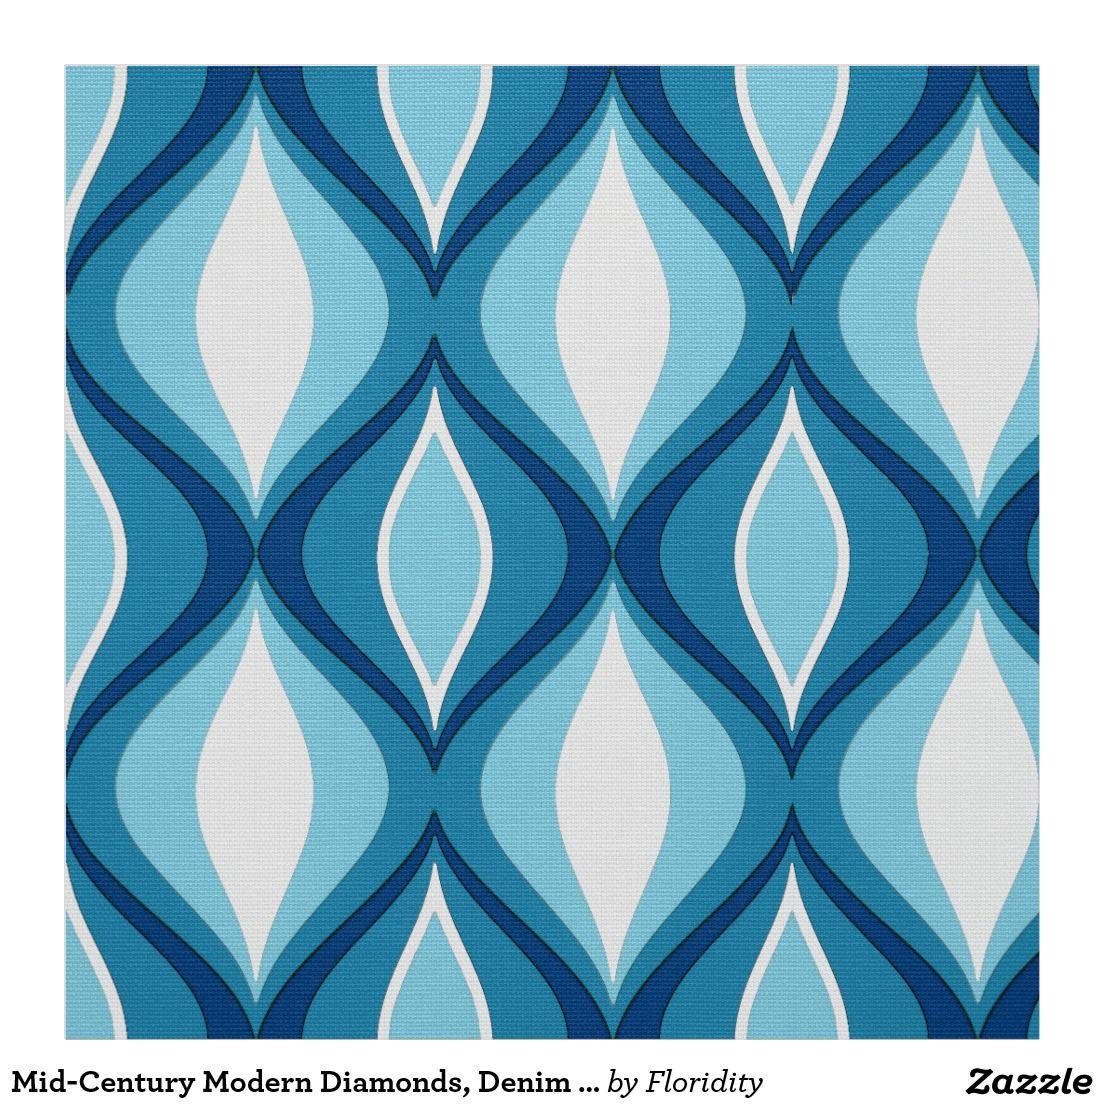 MidCentury Modern Diamonds, Denim Blues Fabric Mid